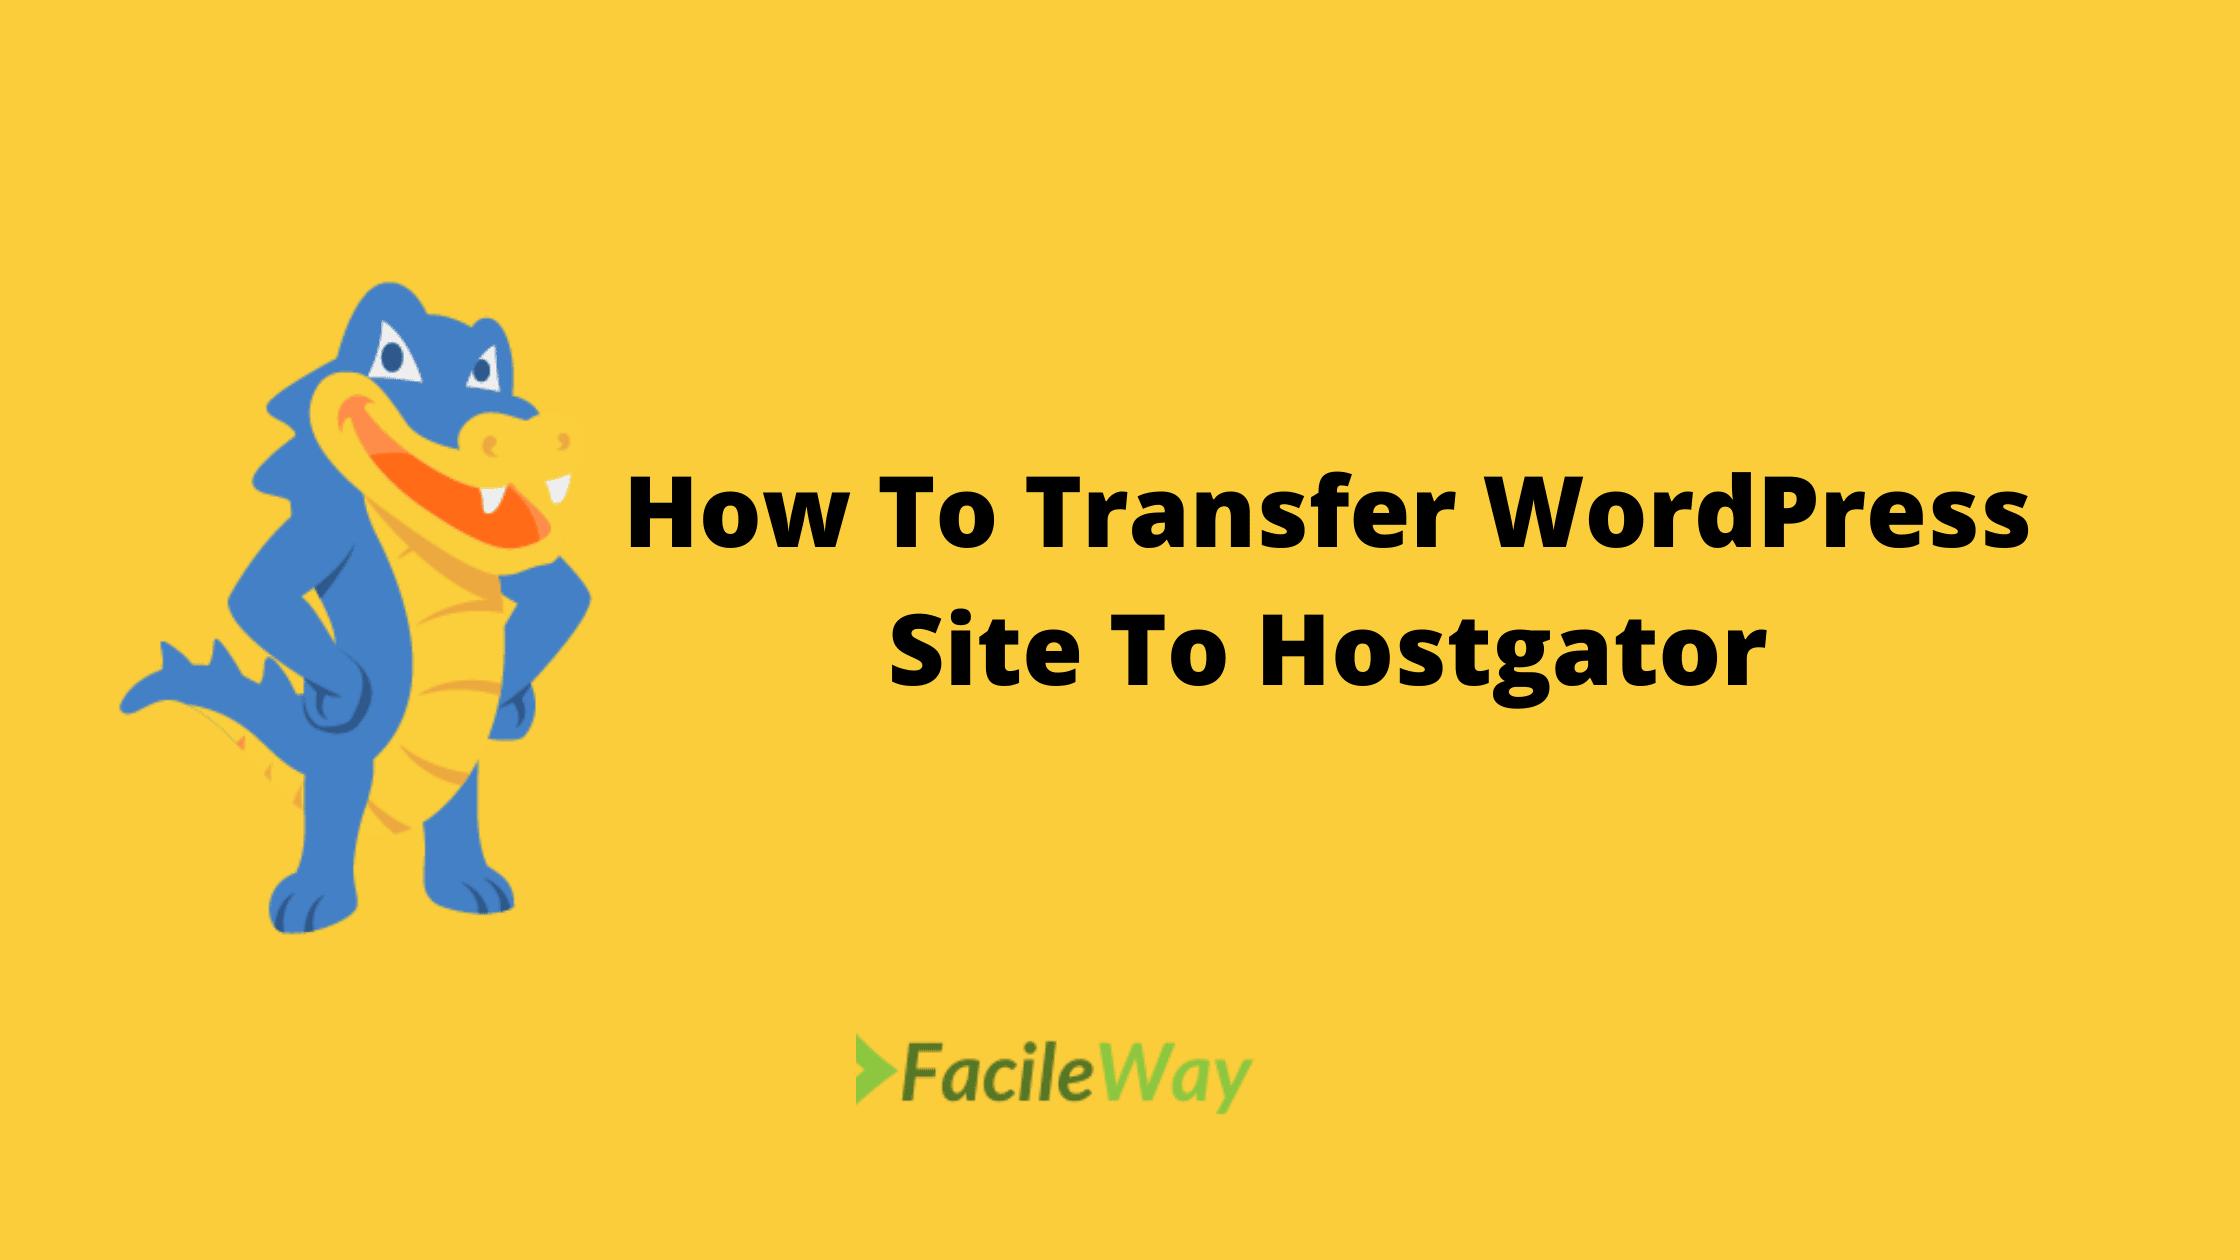 how to transfer WordPress Site To Hostgator